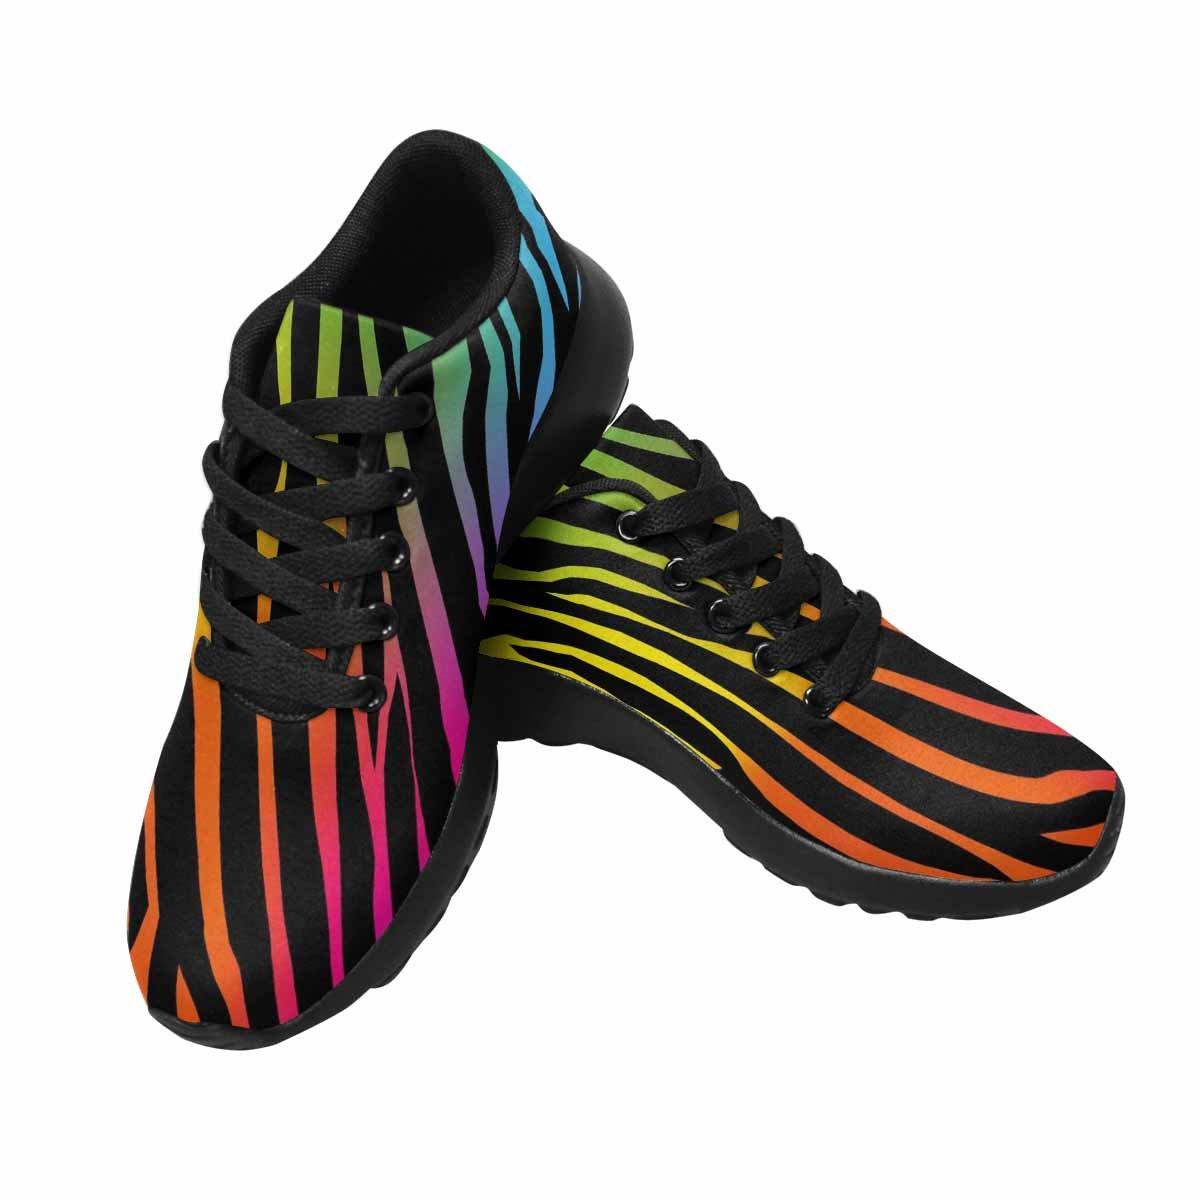 InterestPrint Women's Cross Trainer Trail Running Shoes Jogging Lightweight Sports Walking Athletic Sneakers 11 B(M) US Rainbow Zebra